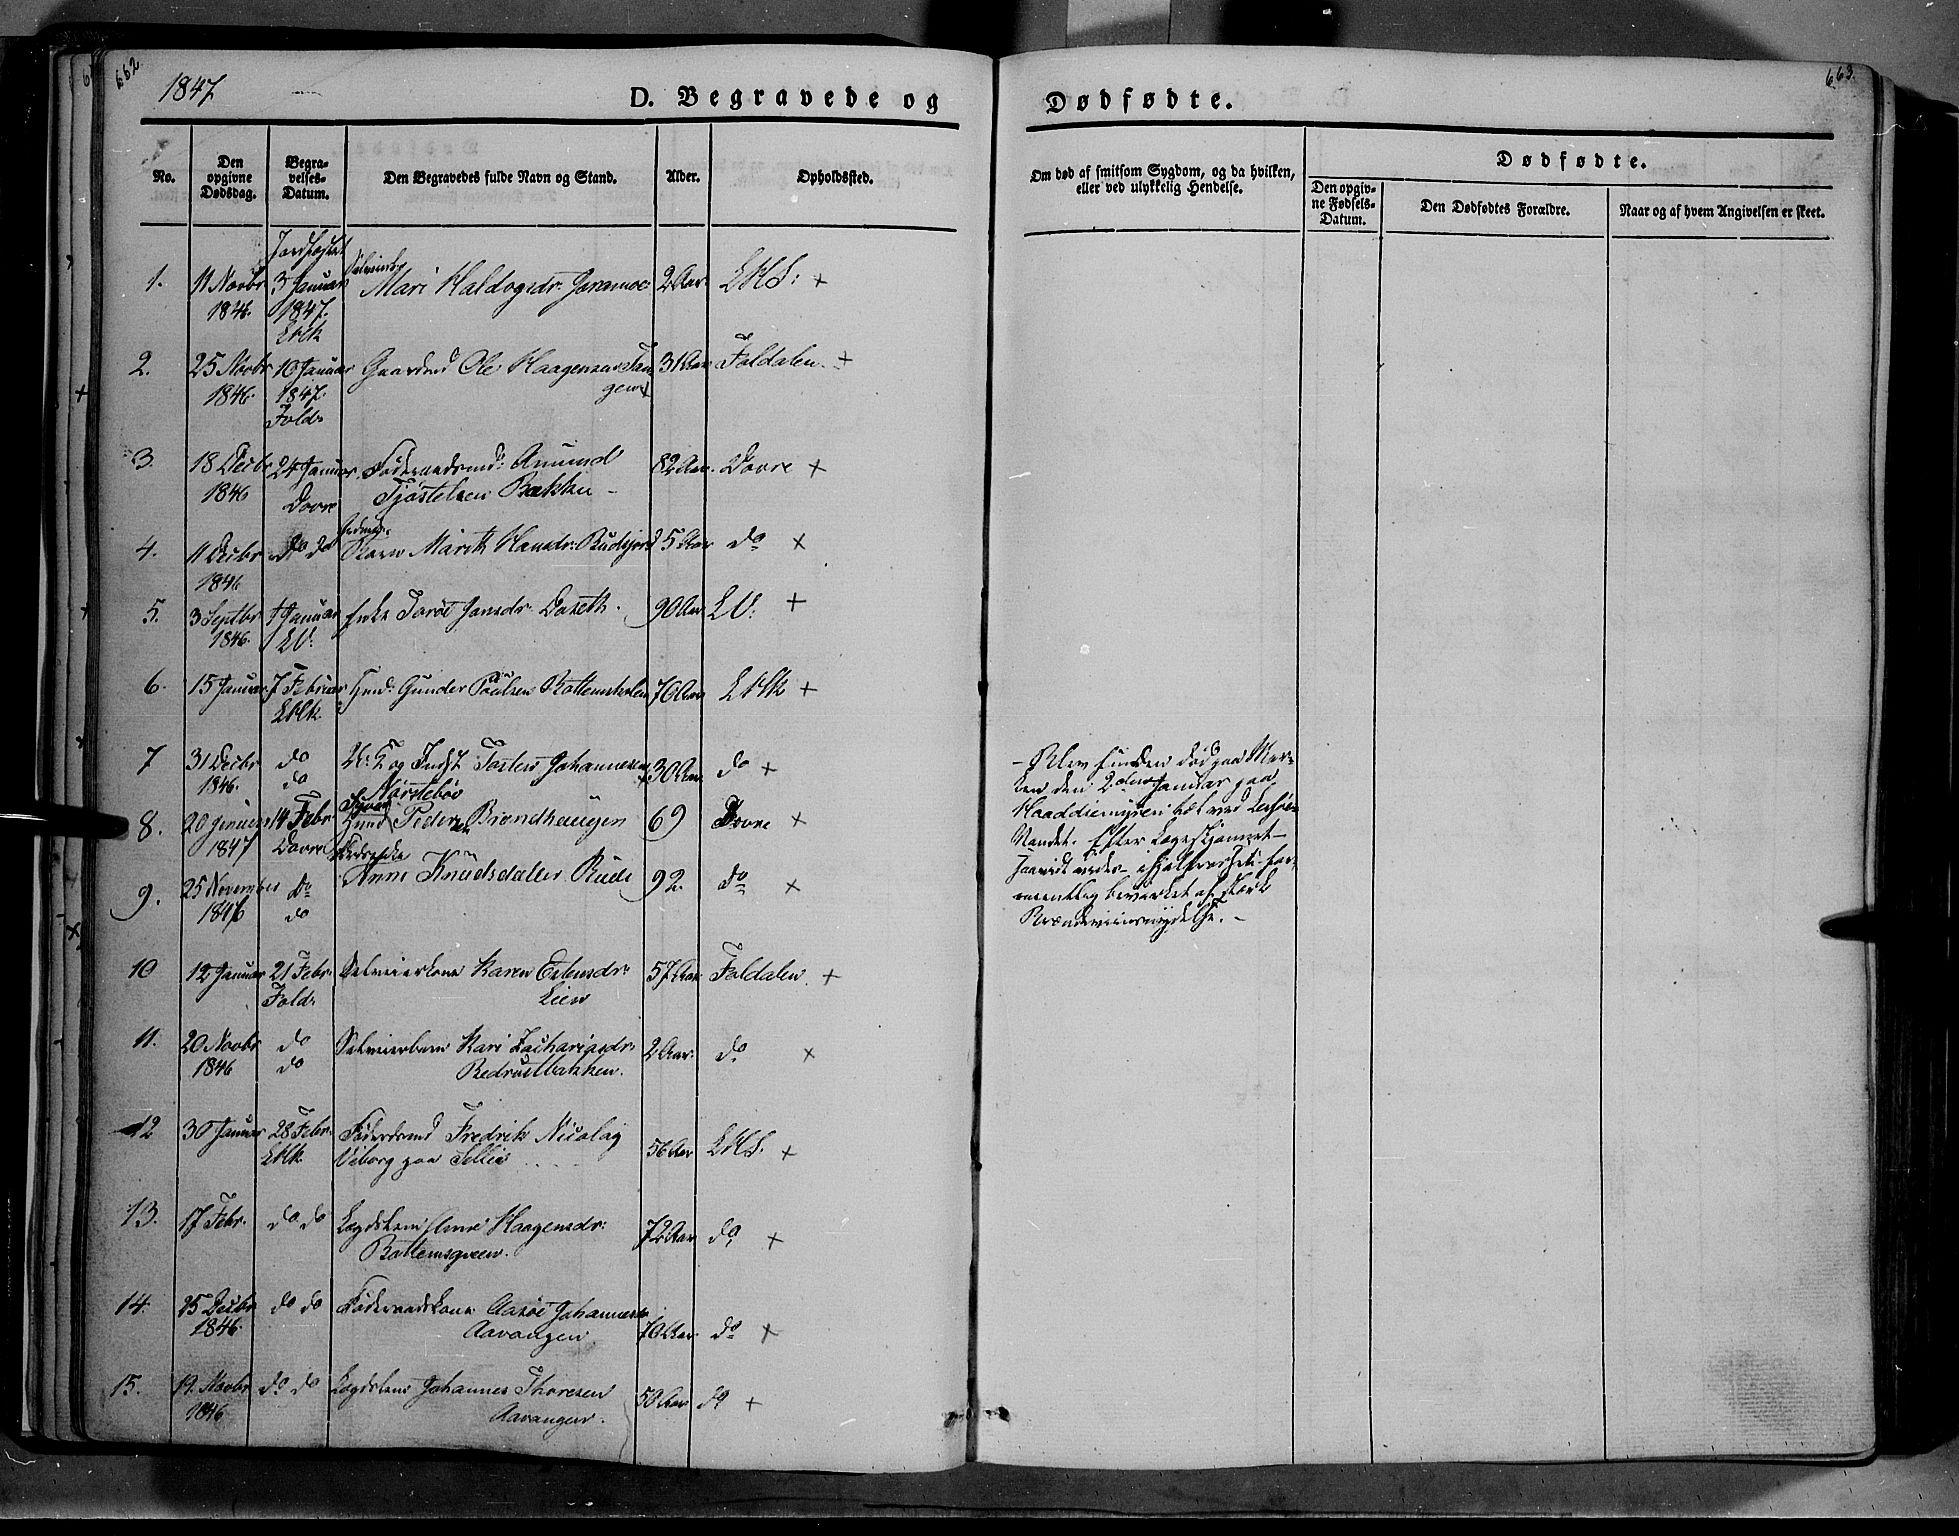 SAH, Lesja prestekontor, Ministerialbok nr. 6B, 1843-1854, s. 662-663